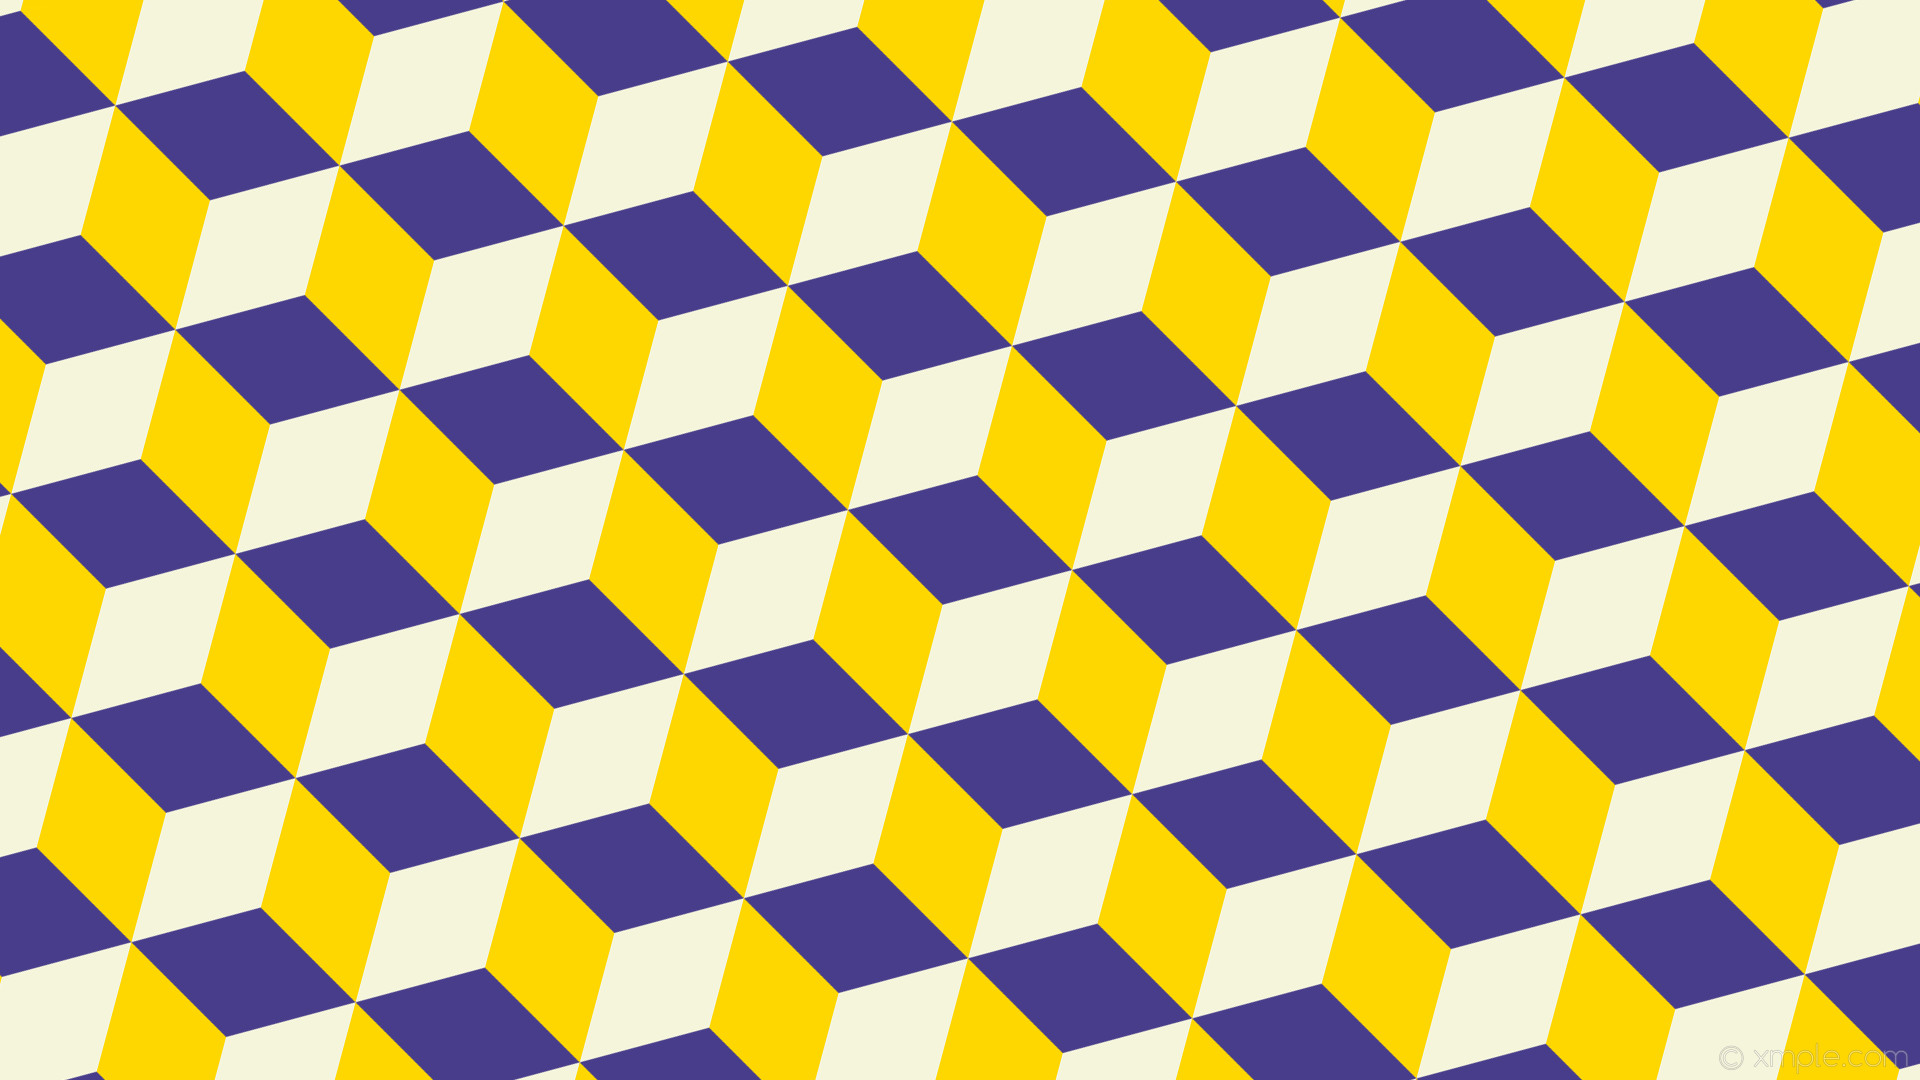 Purple Gold Wallpaper 53 Images